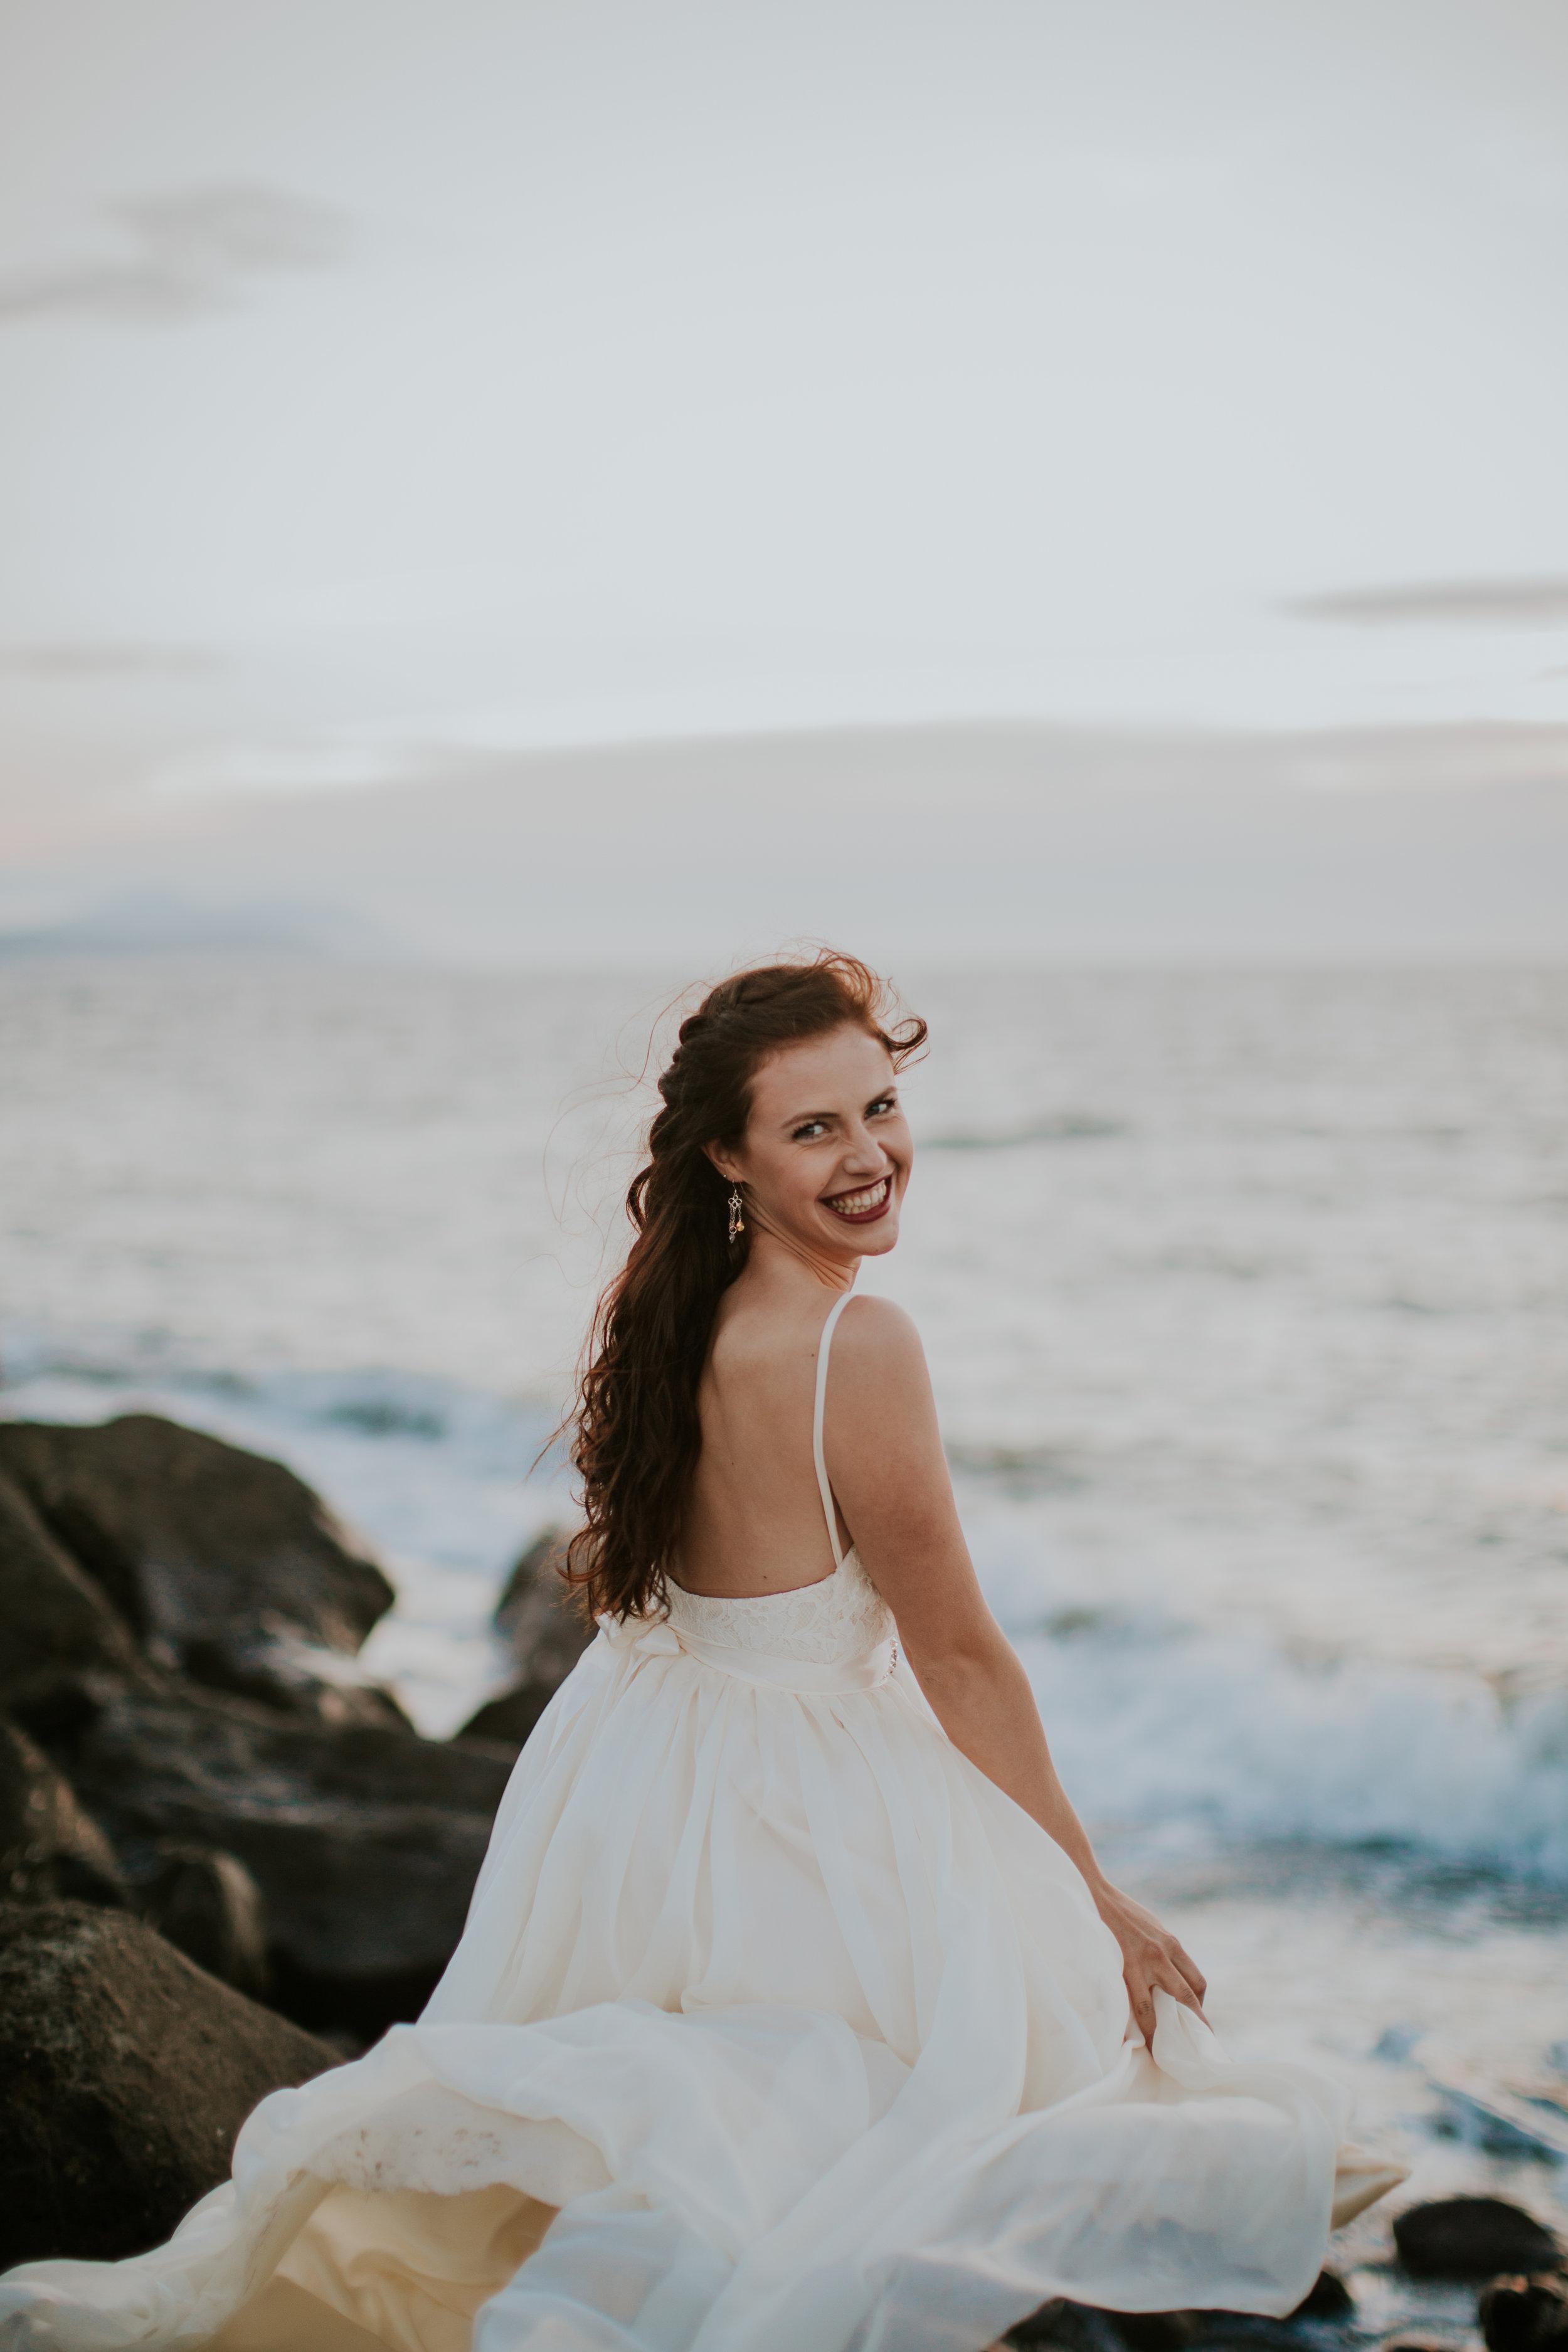 Port-Angeles-Photographer-Olympic-Peninsula-Wedding-Ediz-Hook-bride-dress-Kayla-Dawn-Photography-Olympic-Peninsula-PNW-Photographer-Portrait-Portraiture-Natural-Golden-Hour-Beach (3).jpg